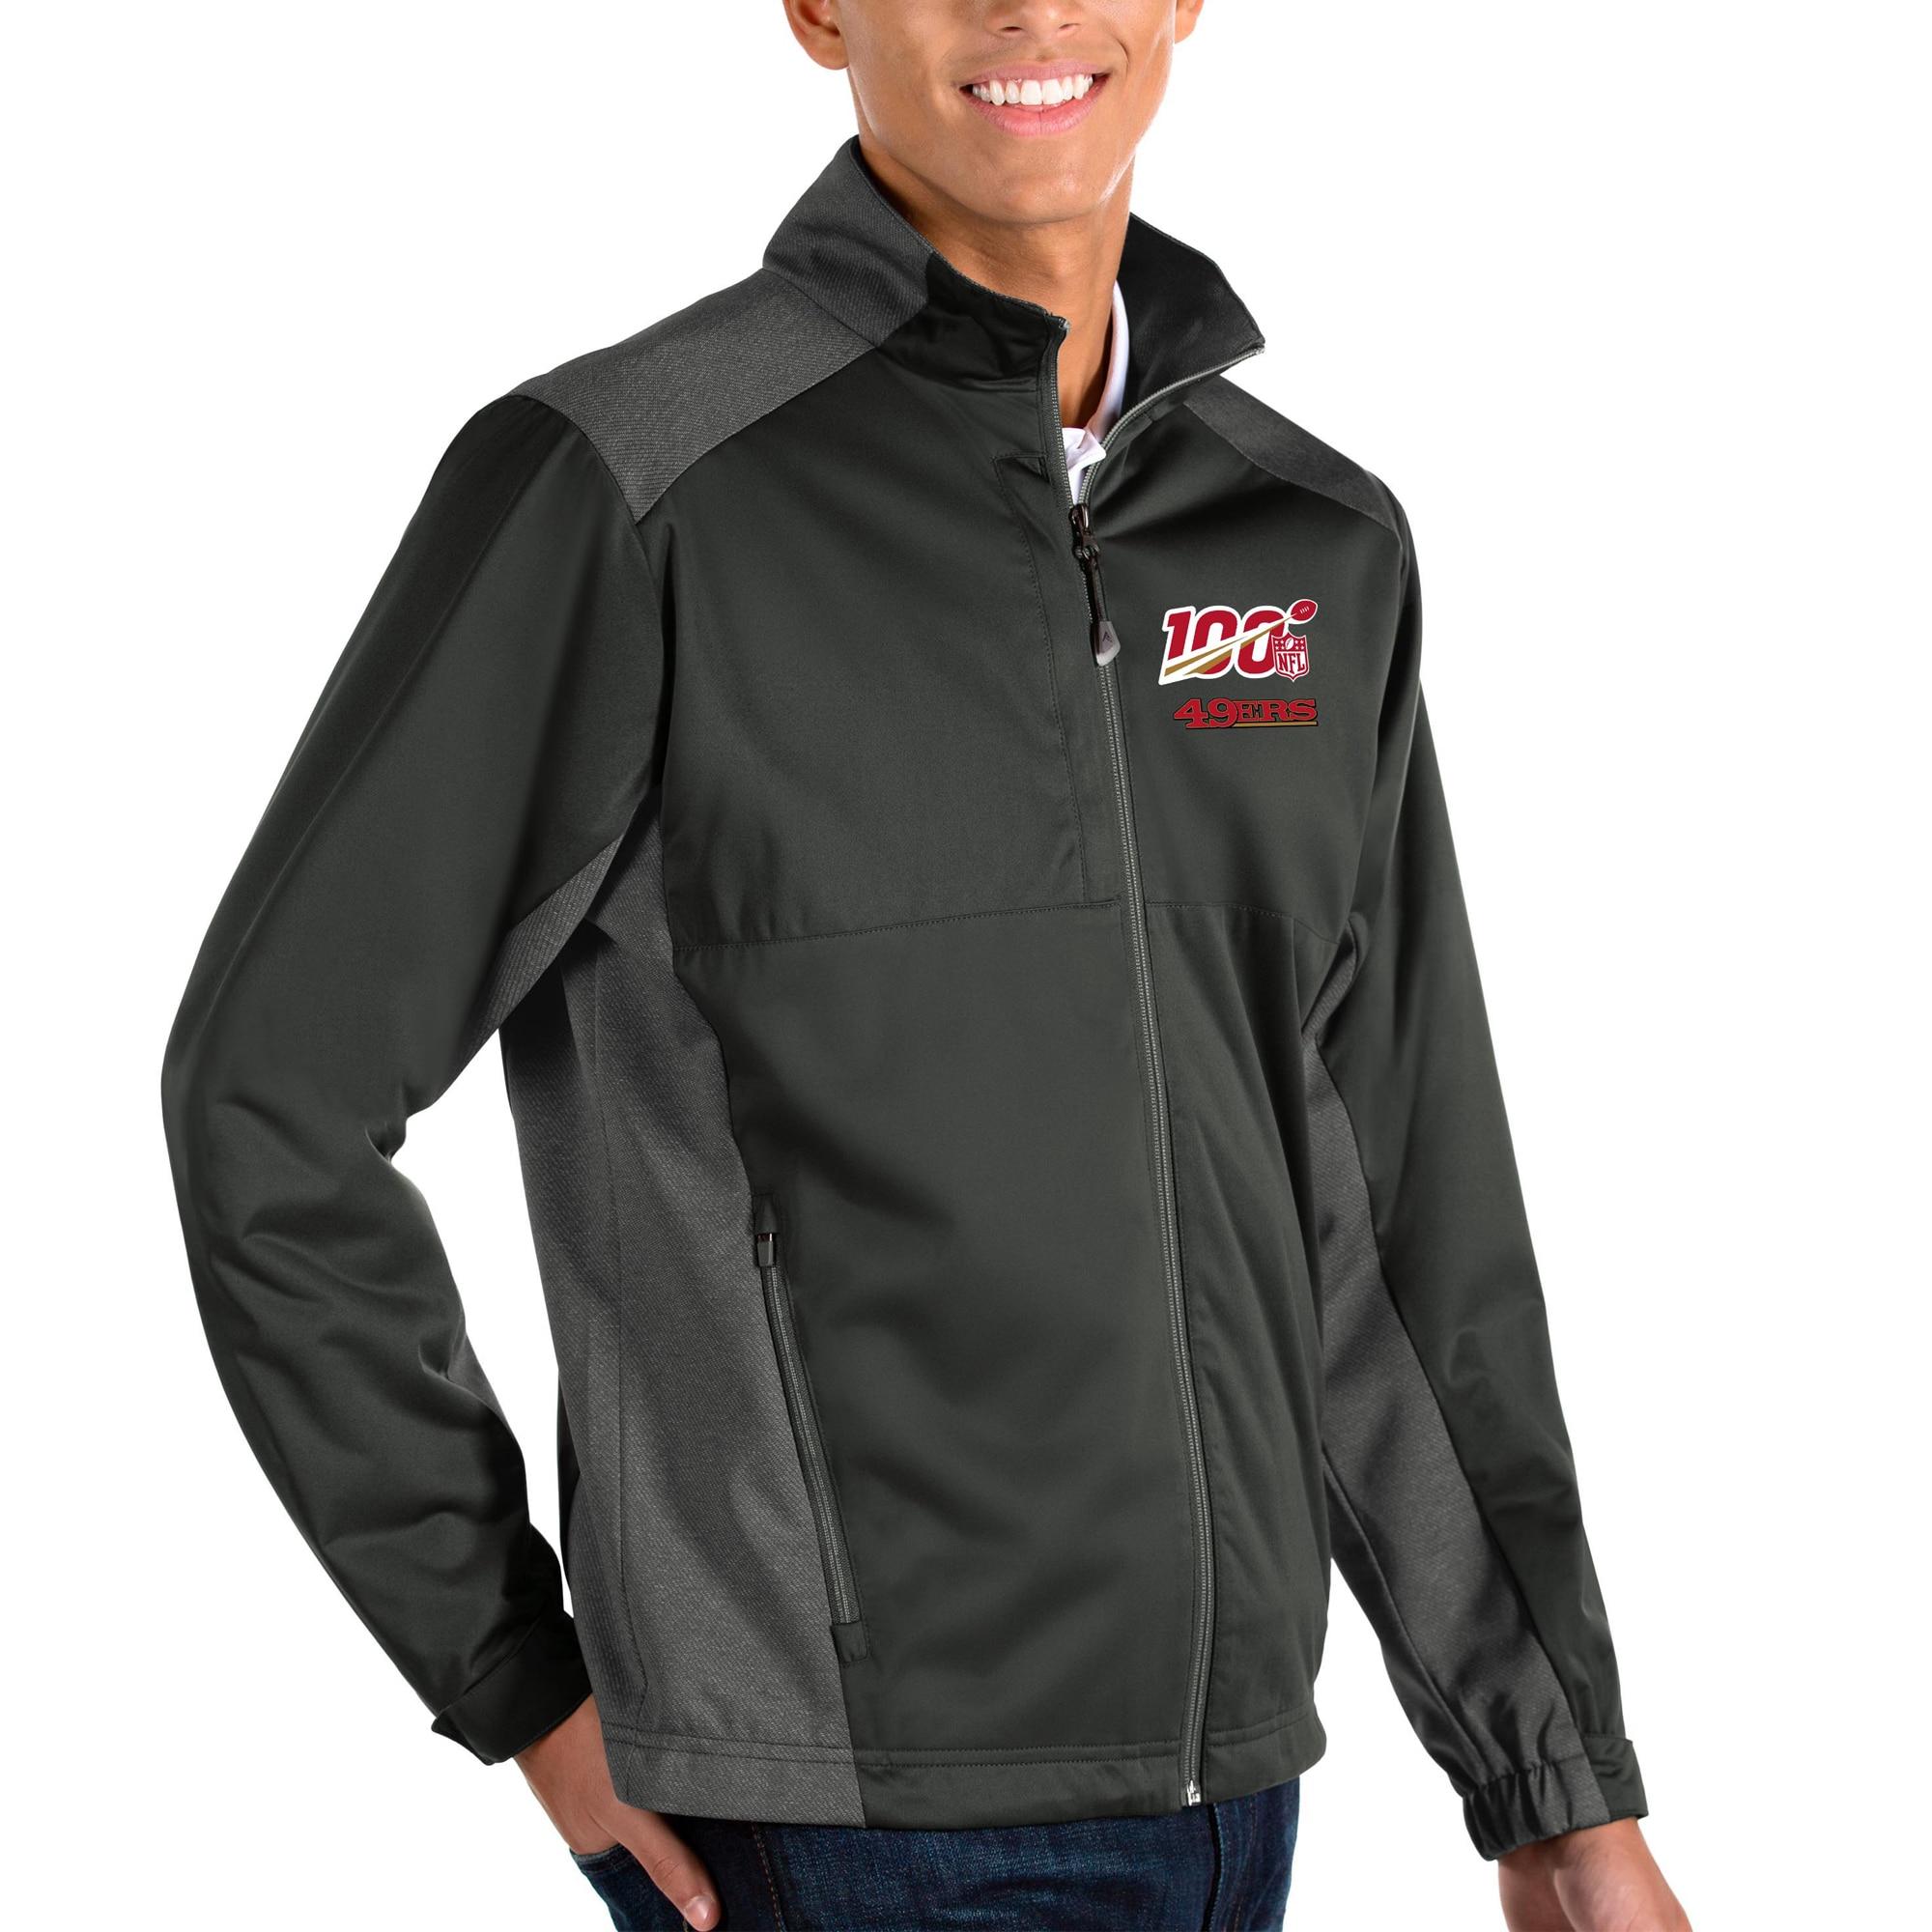 San Francisco 49ers Antigua NFL 100 Revolve Full-Zip Jacket - Charcoal/Heather Charcoal